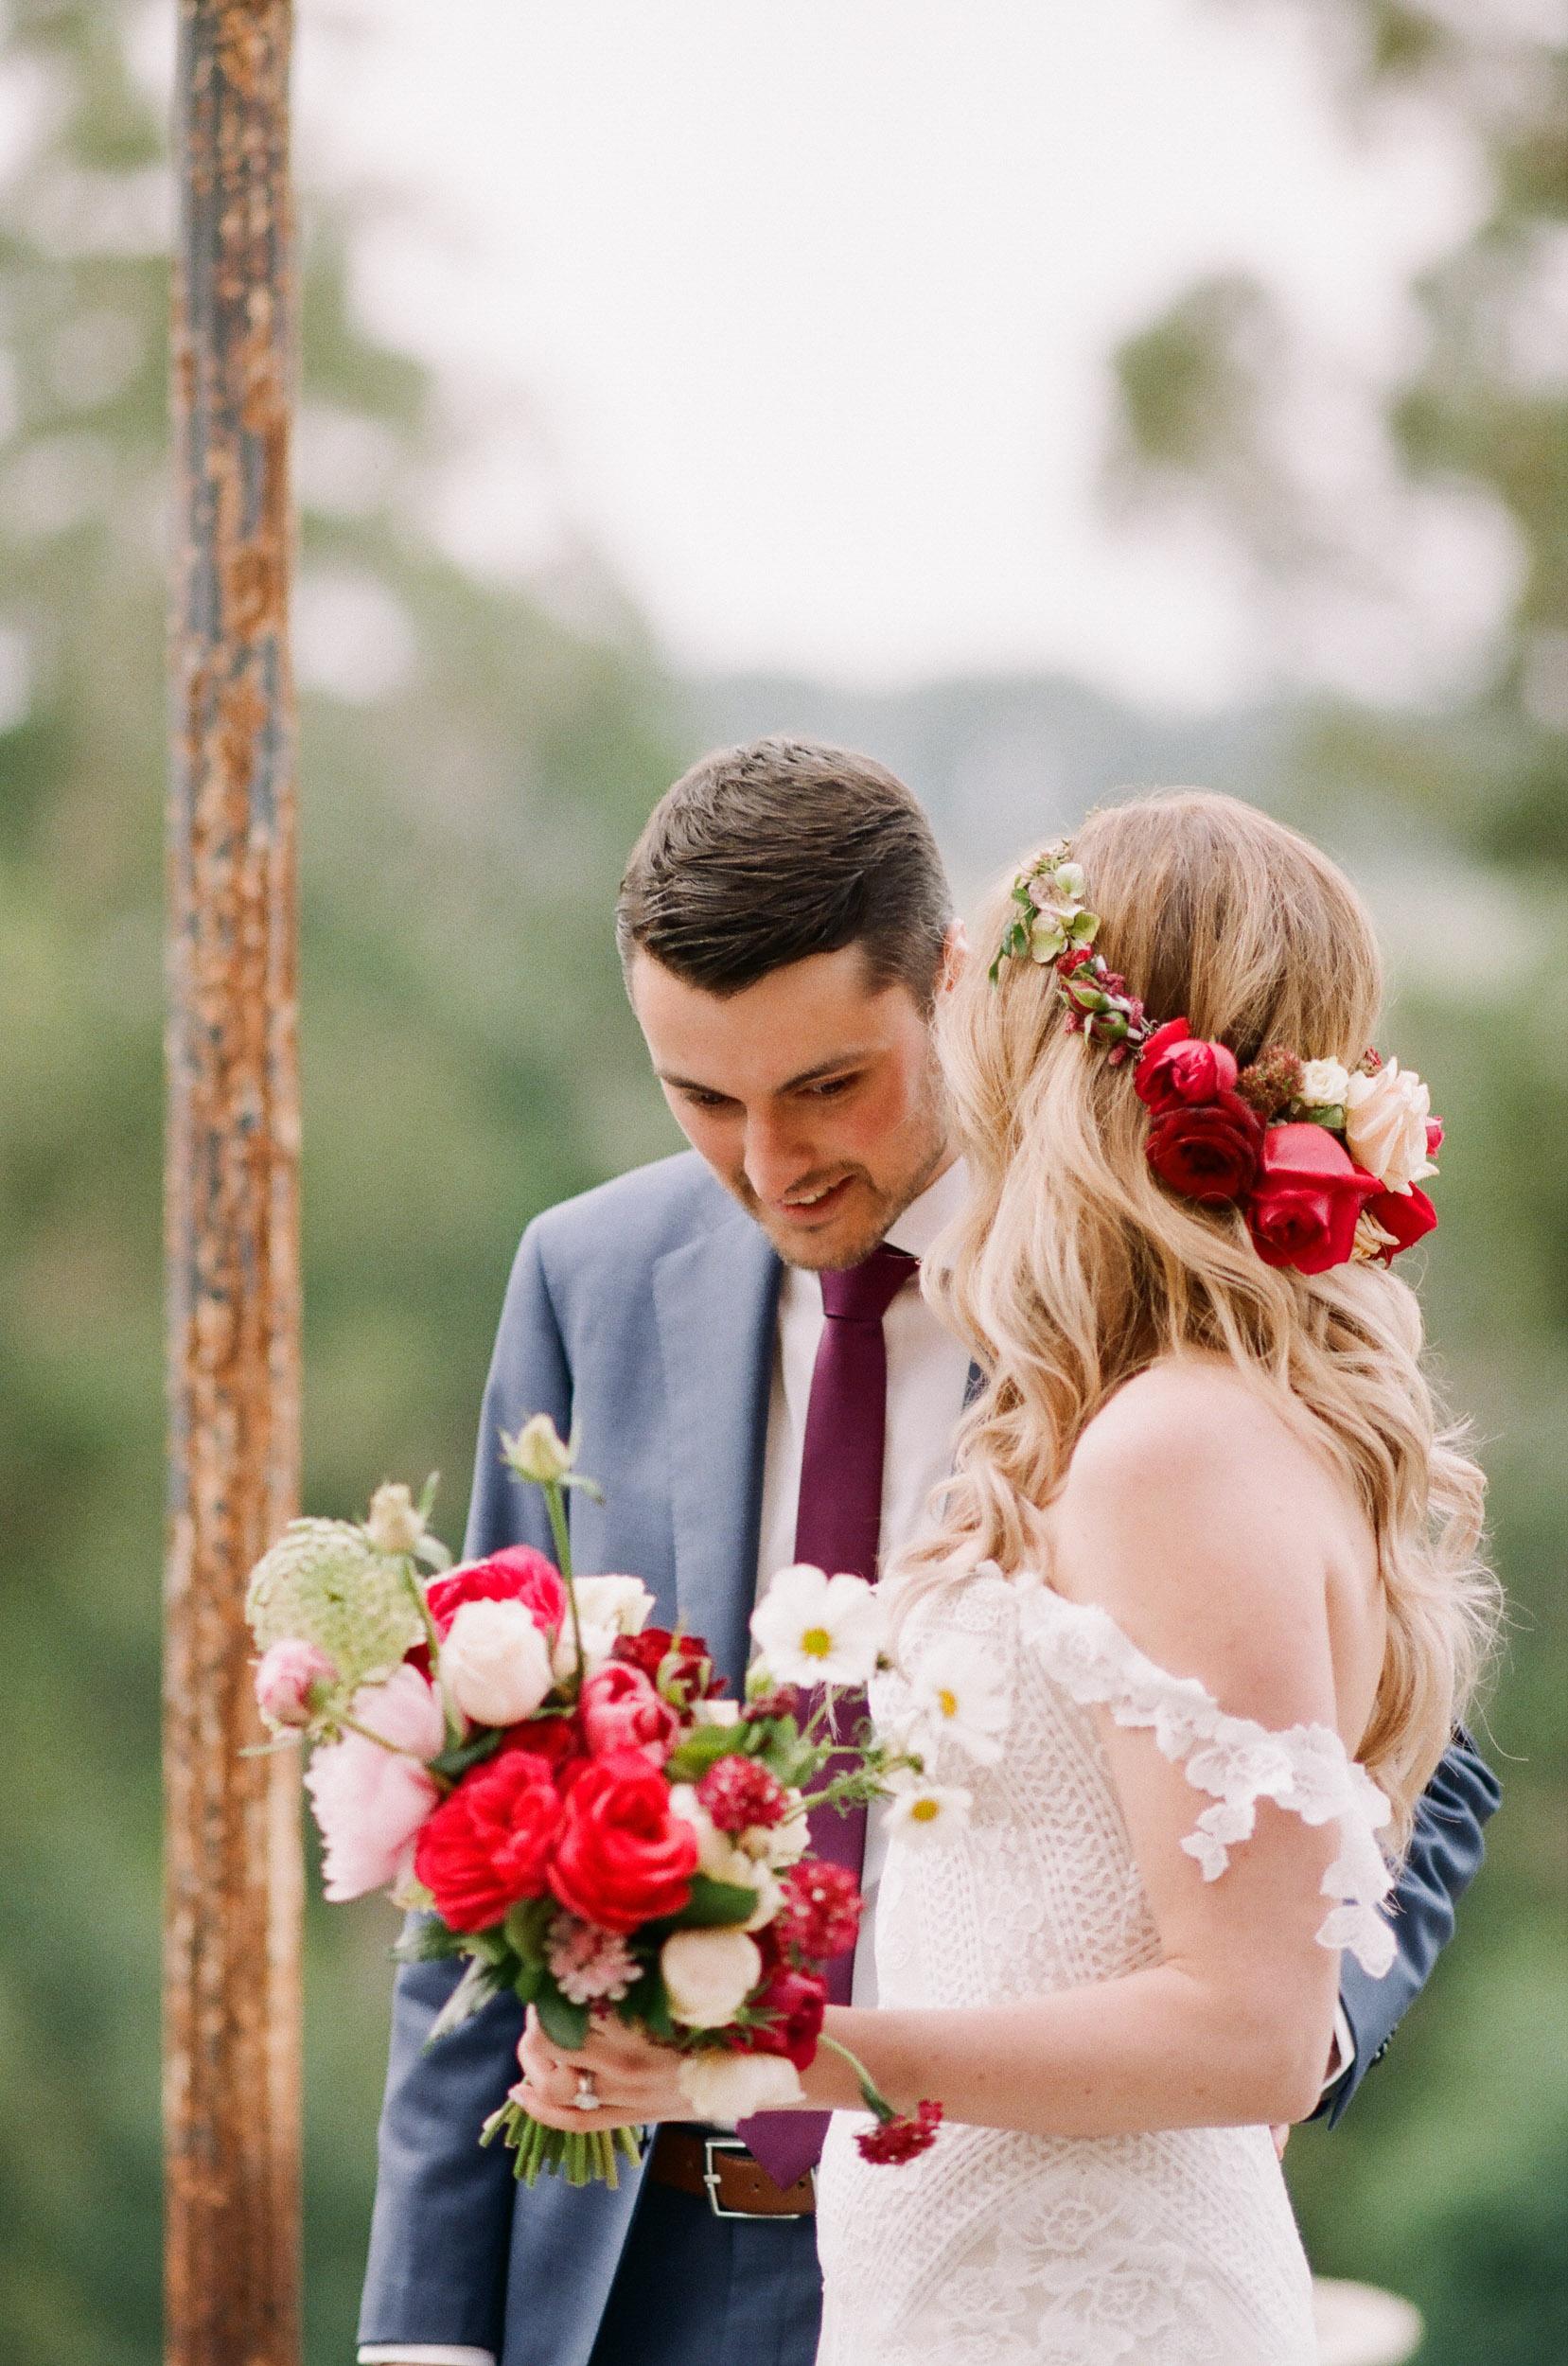 wedding (9 of 24) - 000053030031.jpg